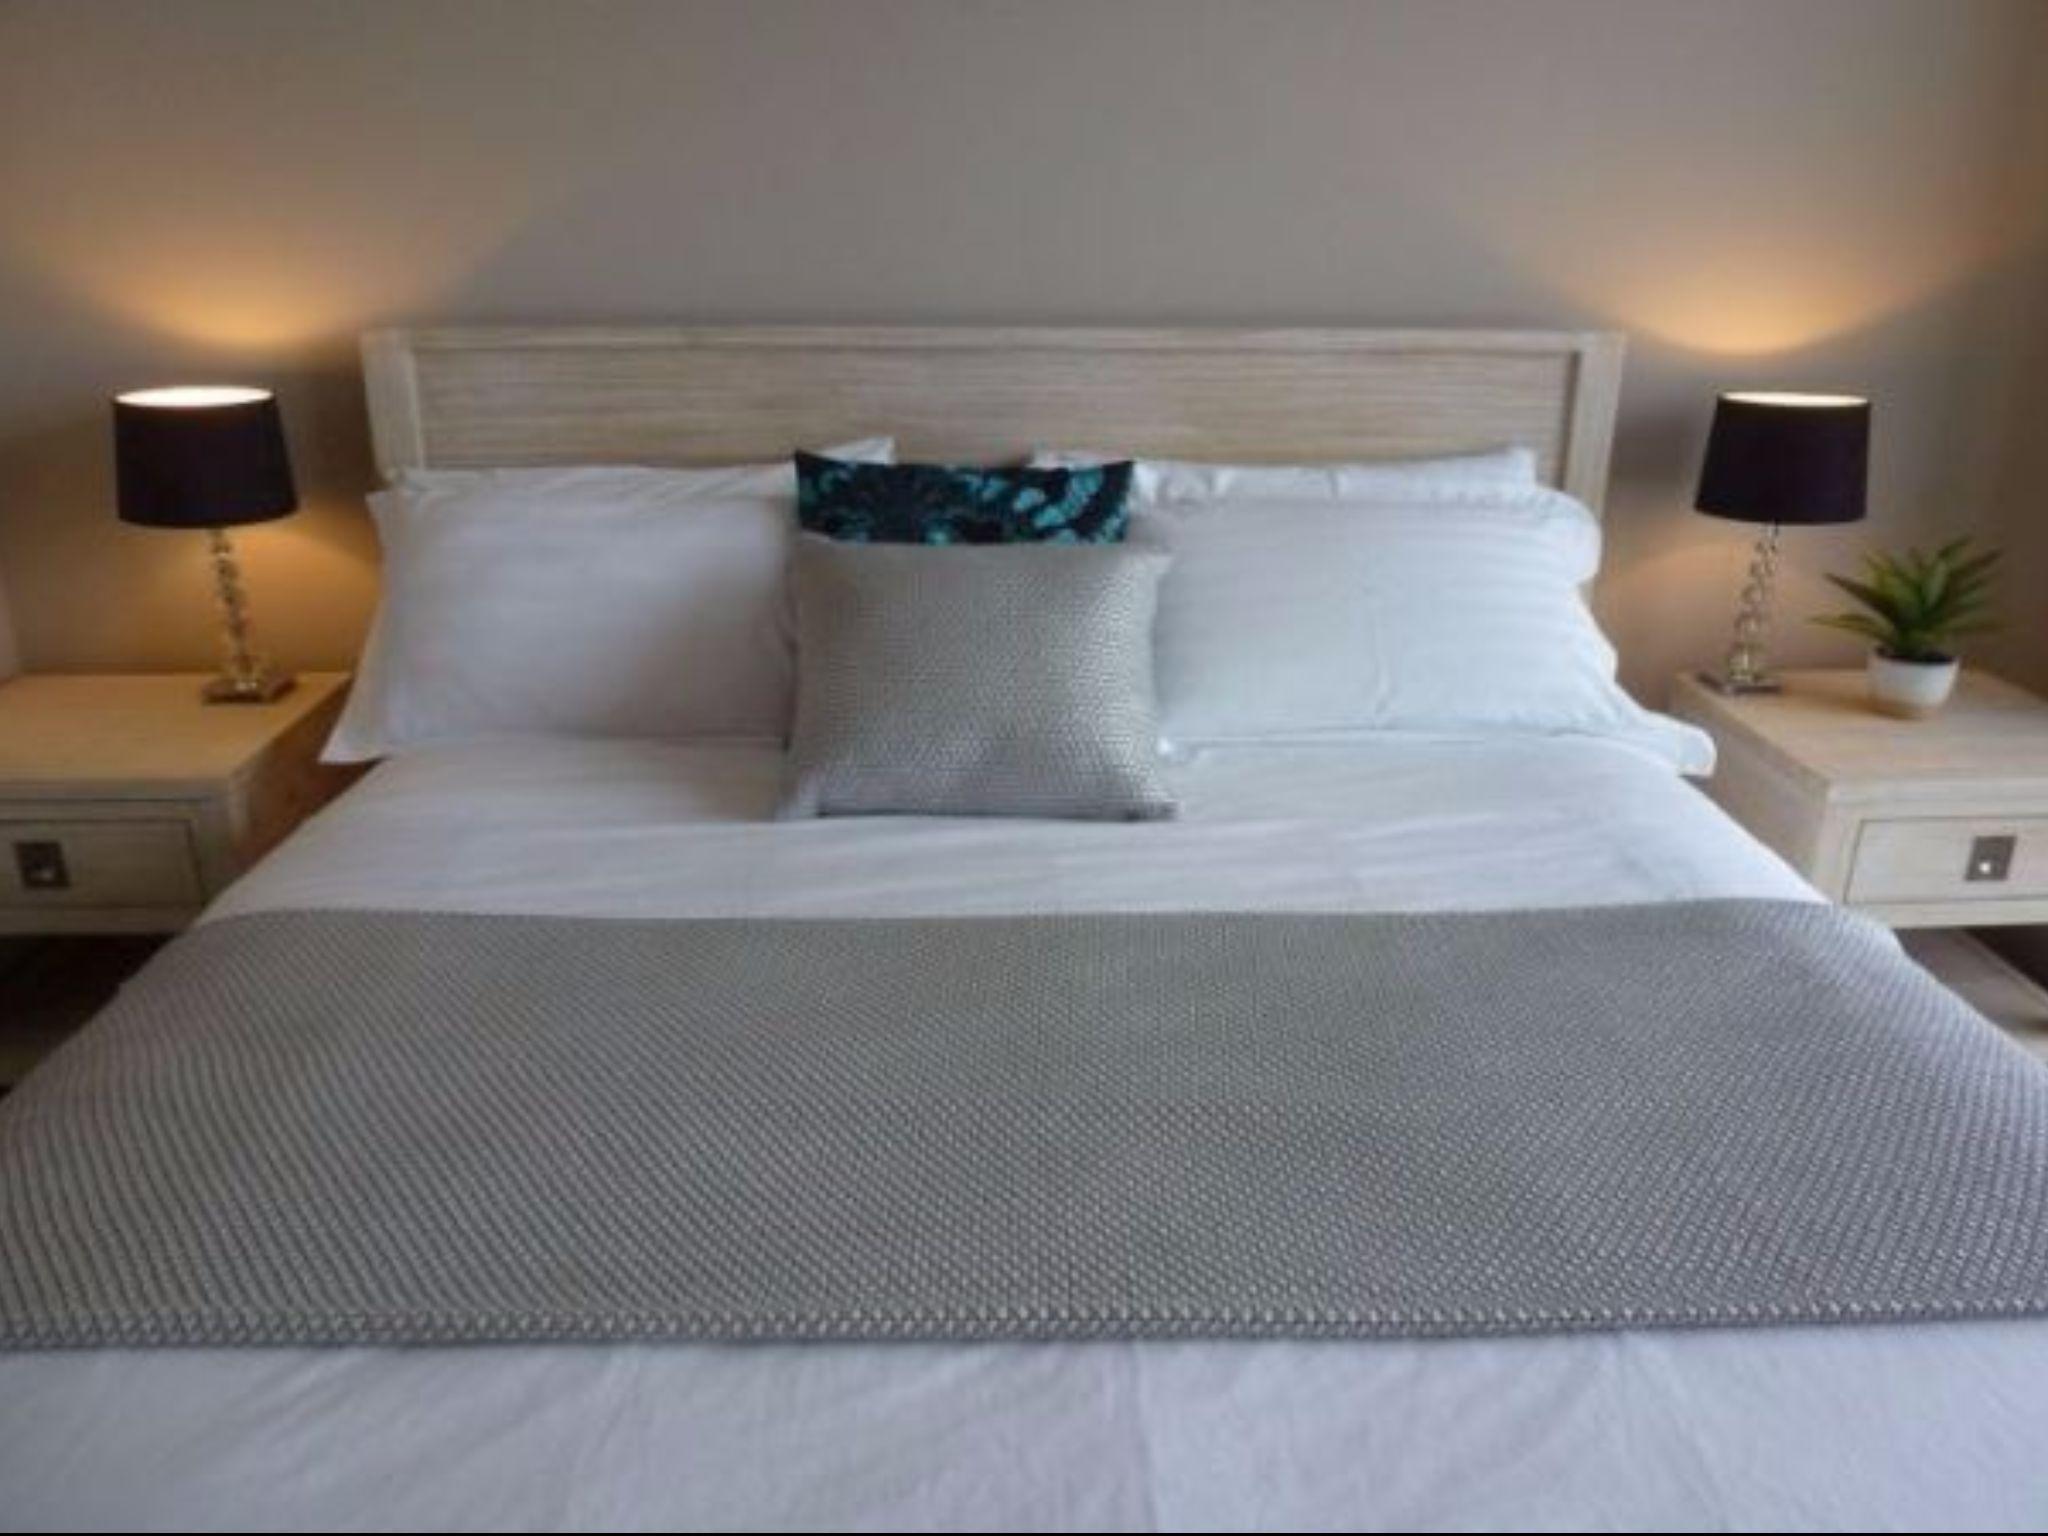 2 Bedroom With Great Sydney CBD View